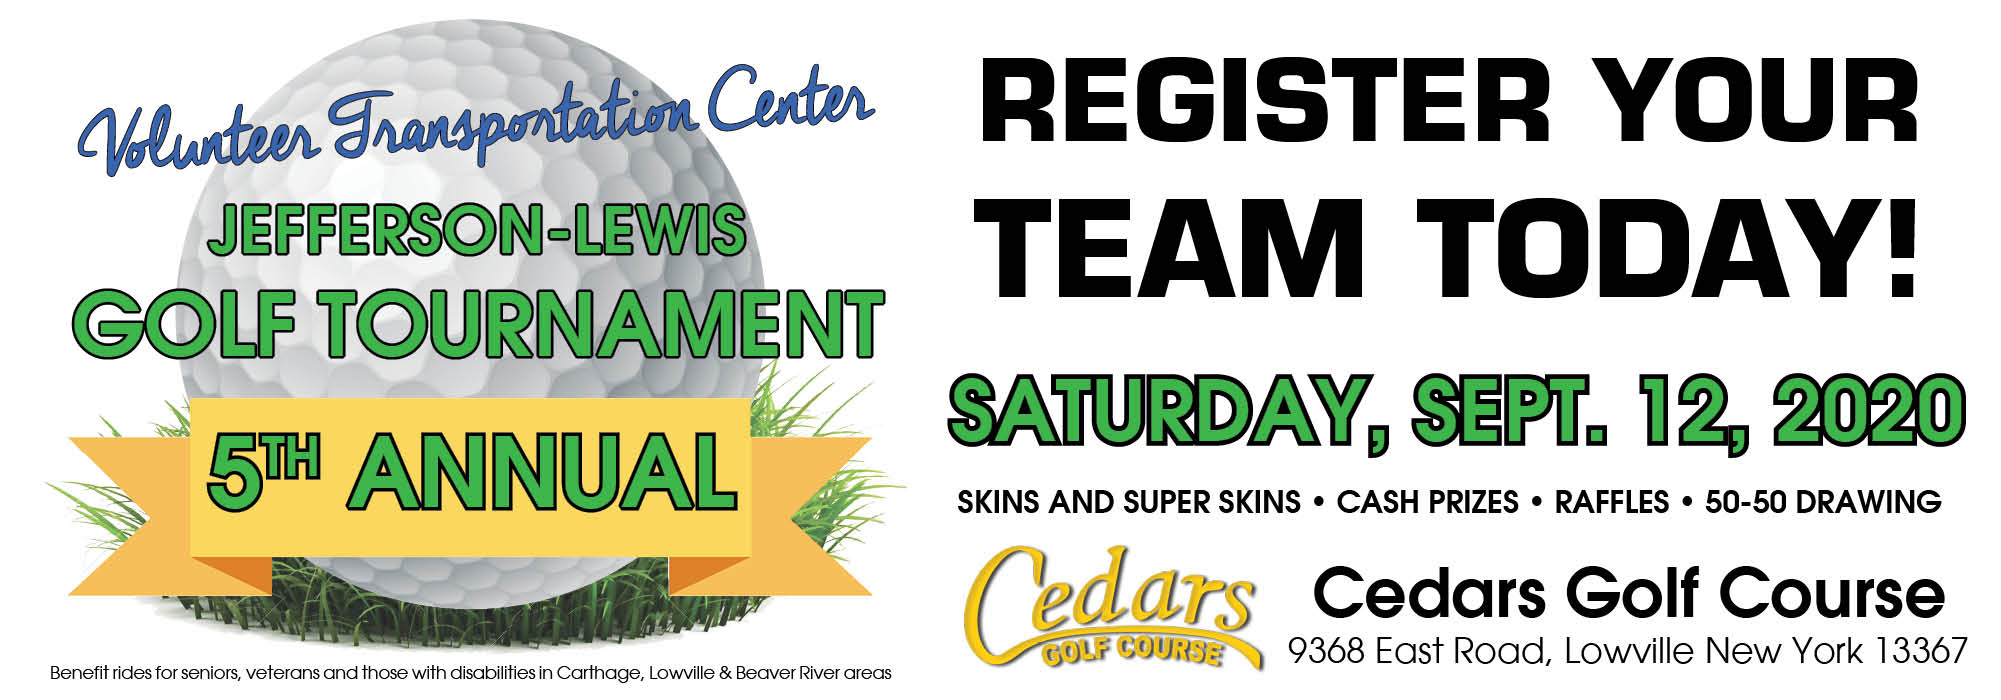 Cedars to Host VTC's 5th Annual  Jefferson-Lewis Golf Tournament